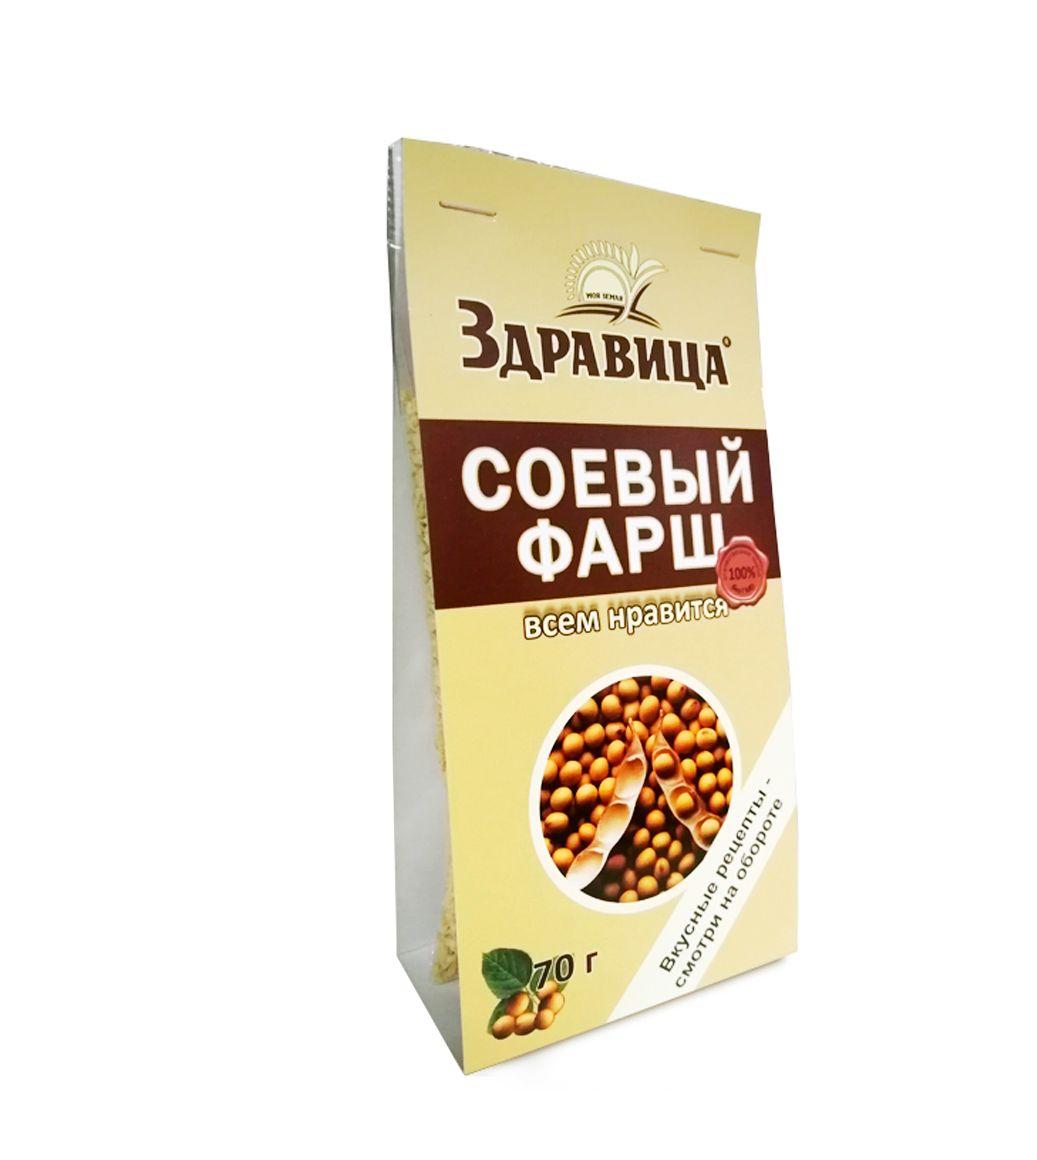 "Zdravitsa / Soy Minced Meat ""Zdravitsa"" in a package of 16 pcs., 70 g each"